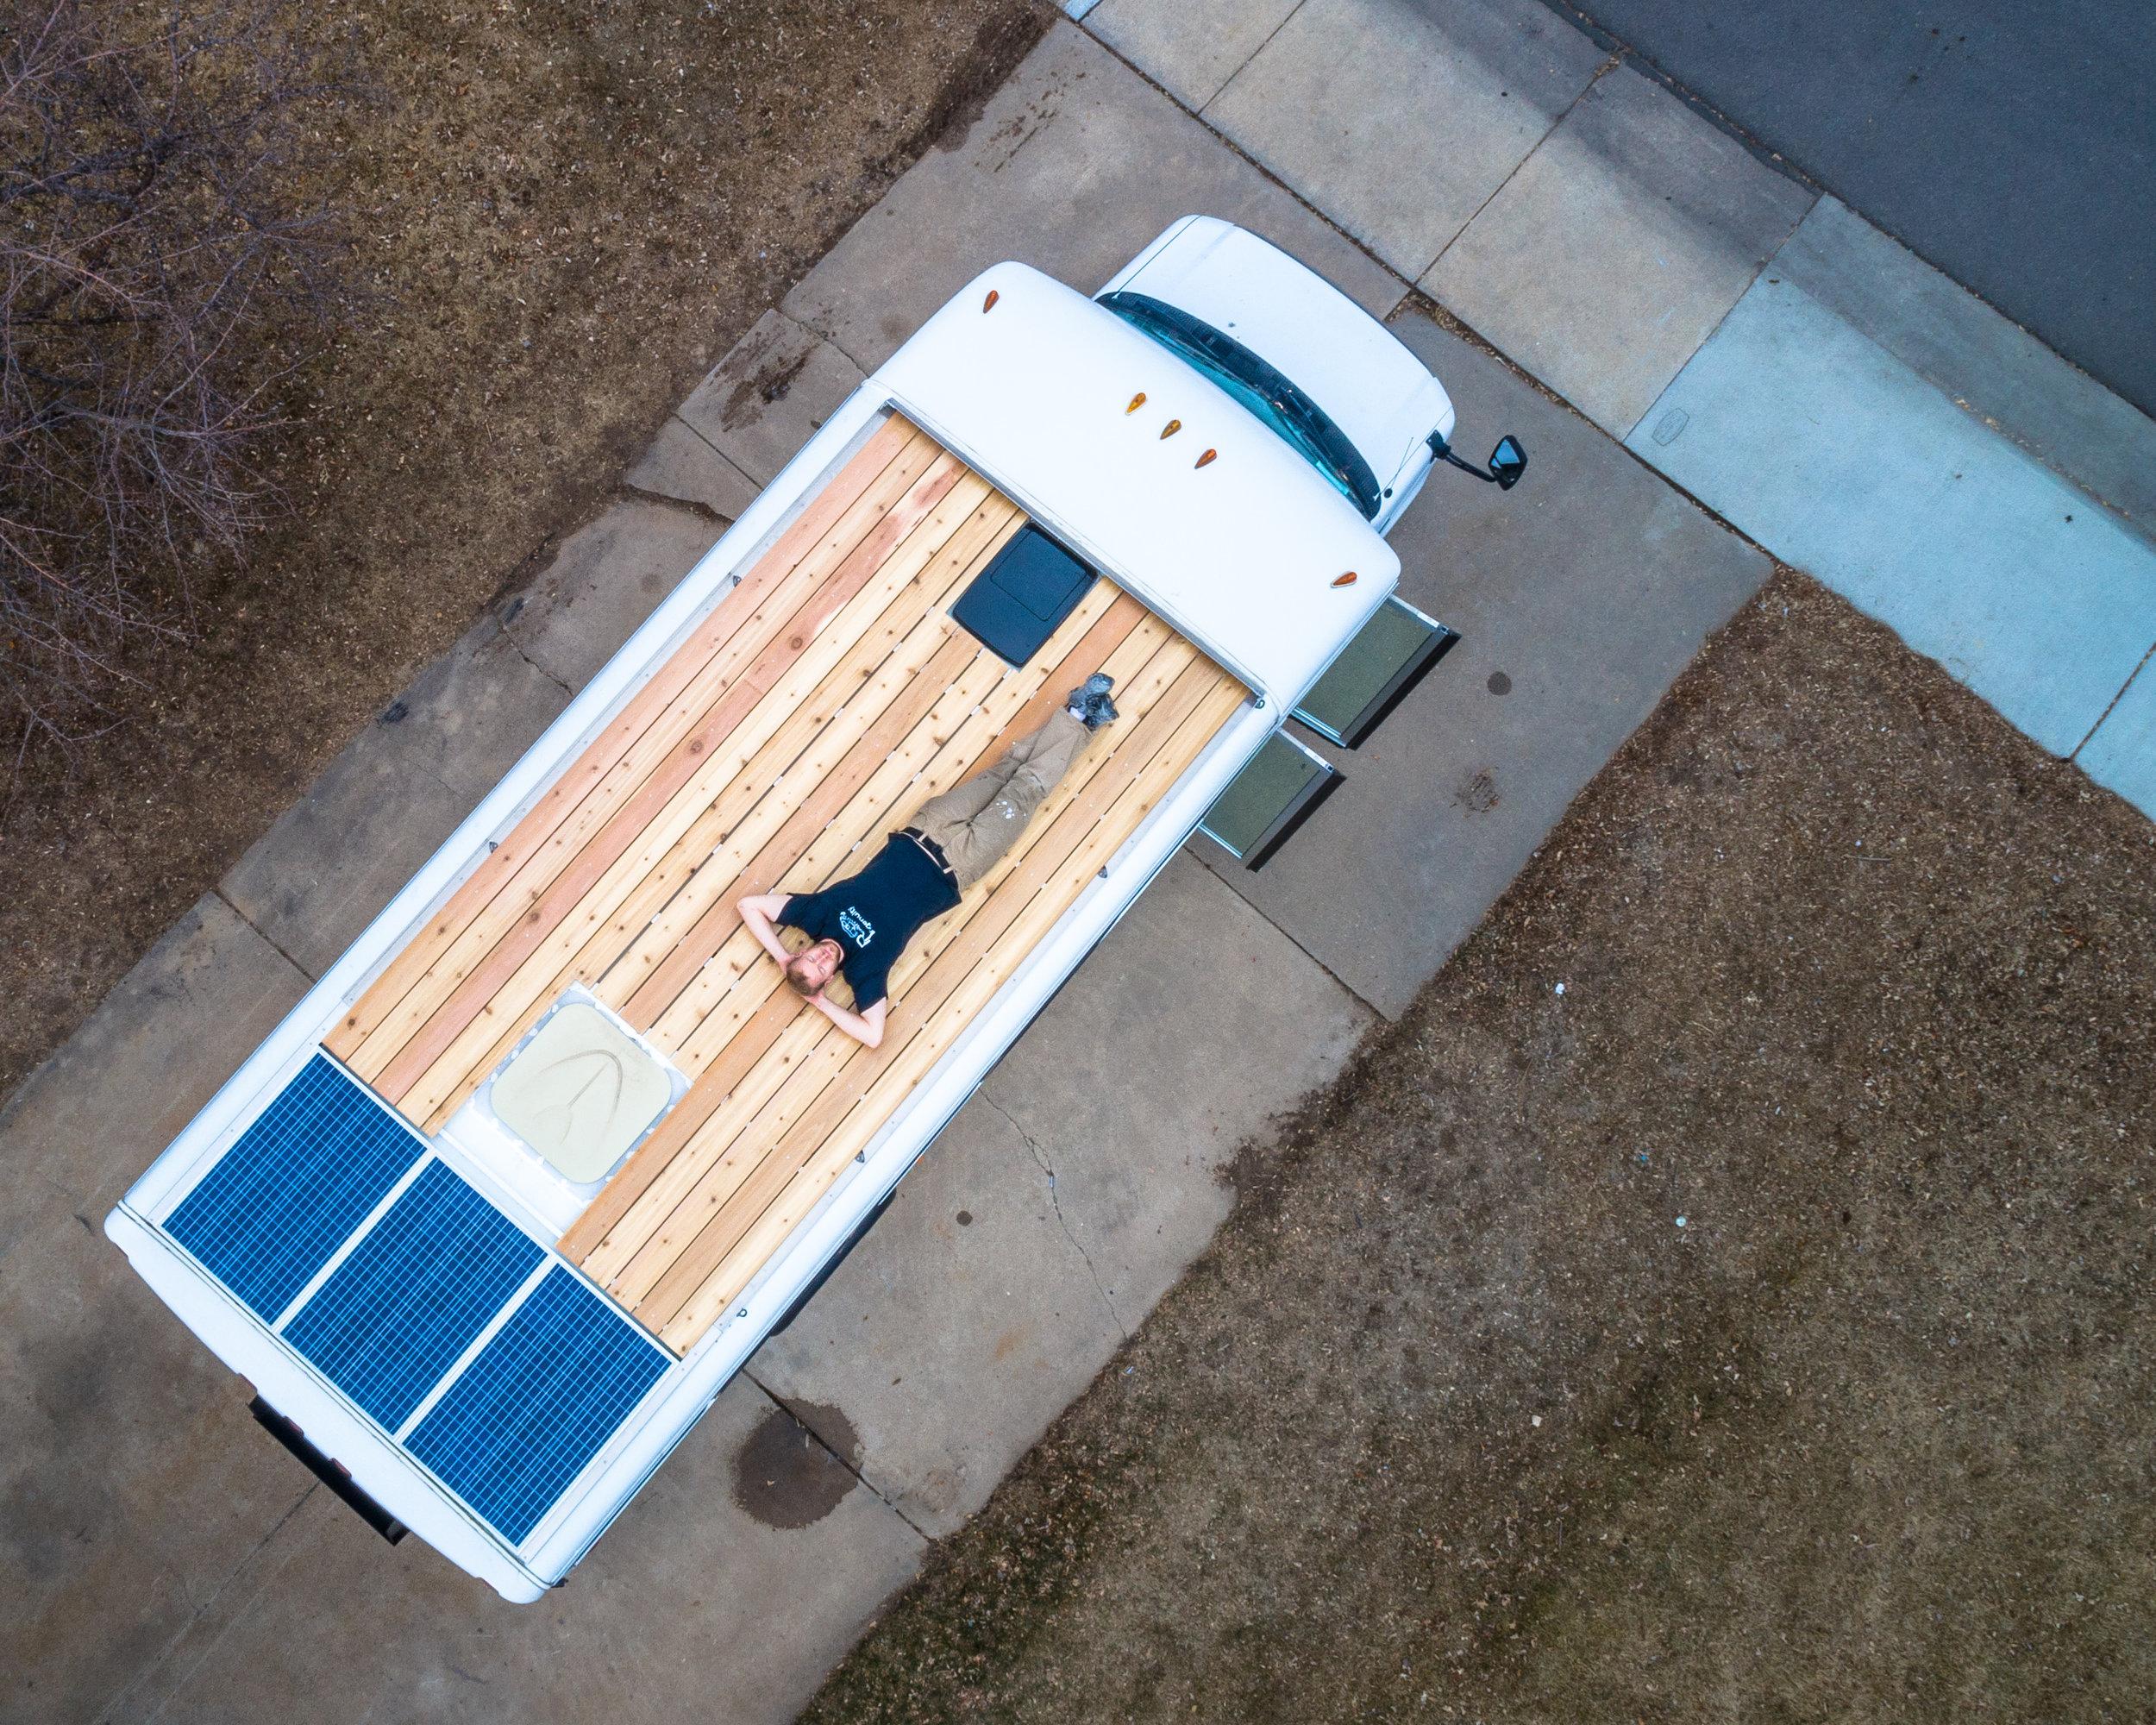 02.27.2019 Shuttle Bus Finish Photos Edit One Drone-1.jpg